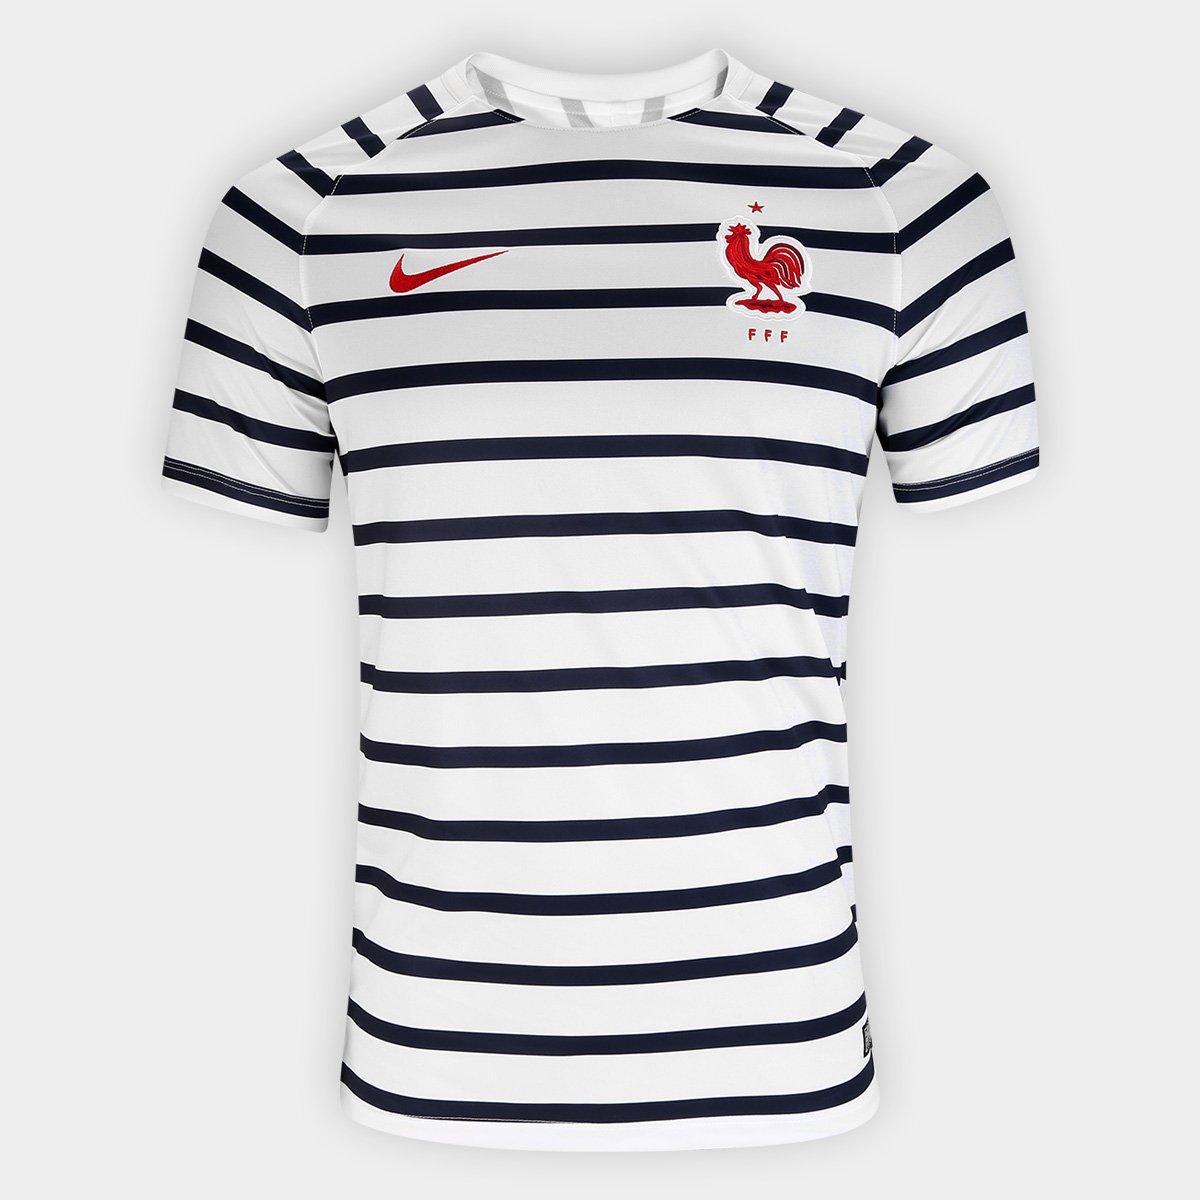 beed6b269c692 Camisa Nike França Dry Squad SS Masculina - Compre Agora